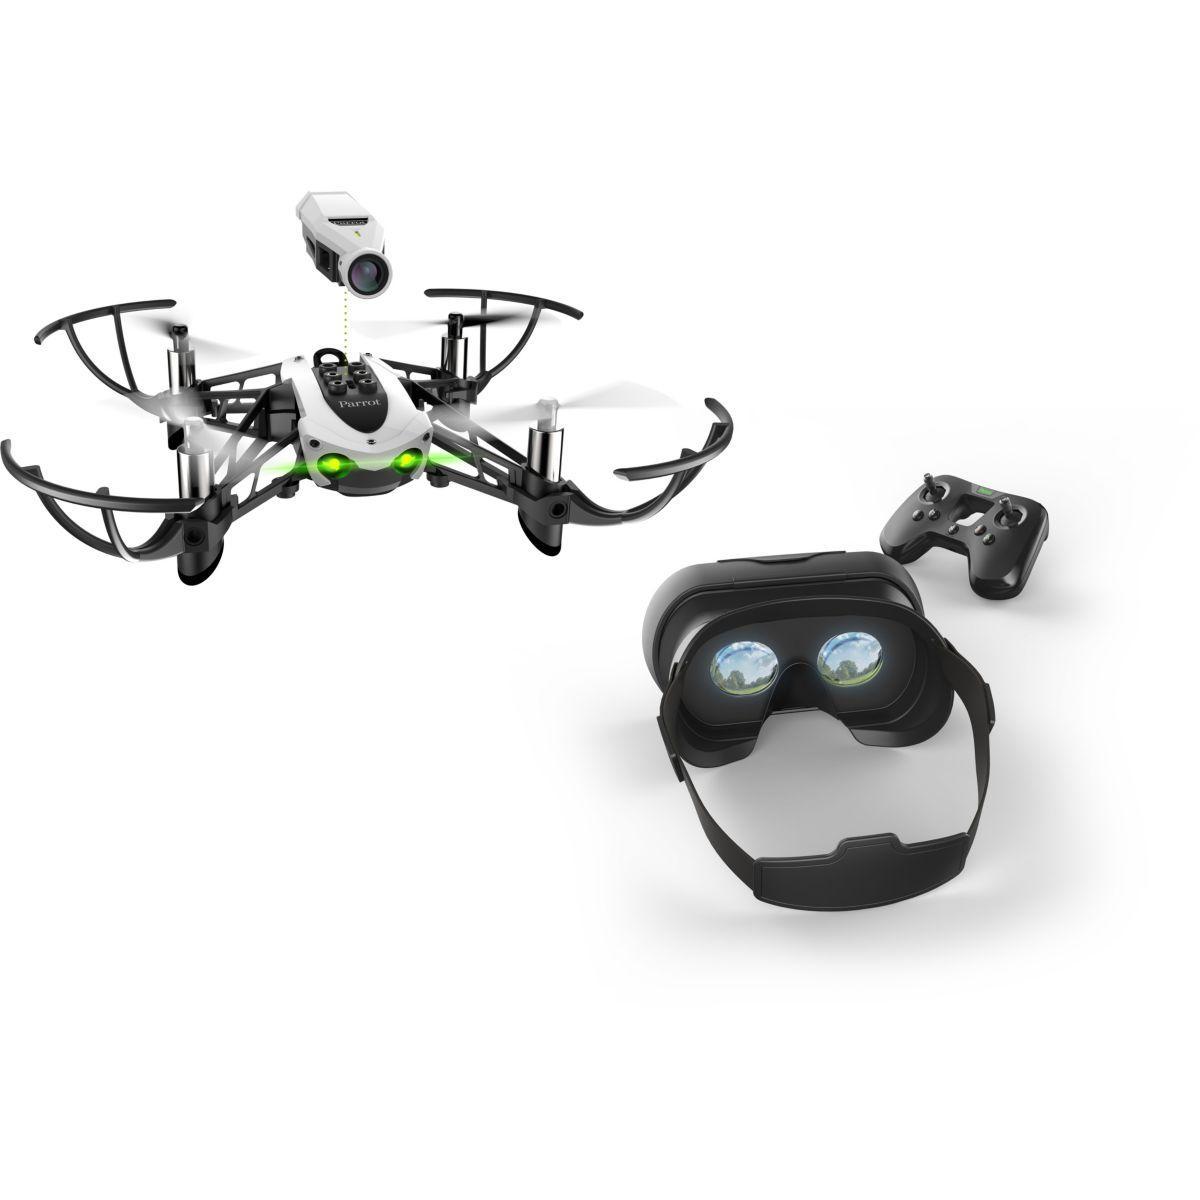 Drones parrot mambo + fpv - livraison offerte : code liv (photo)